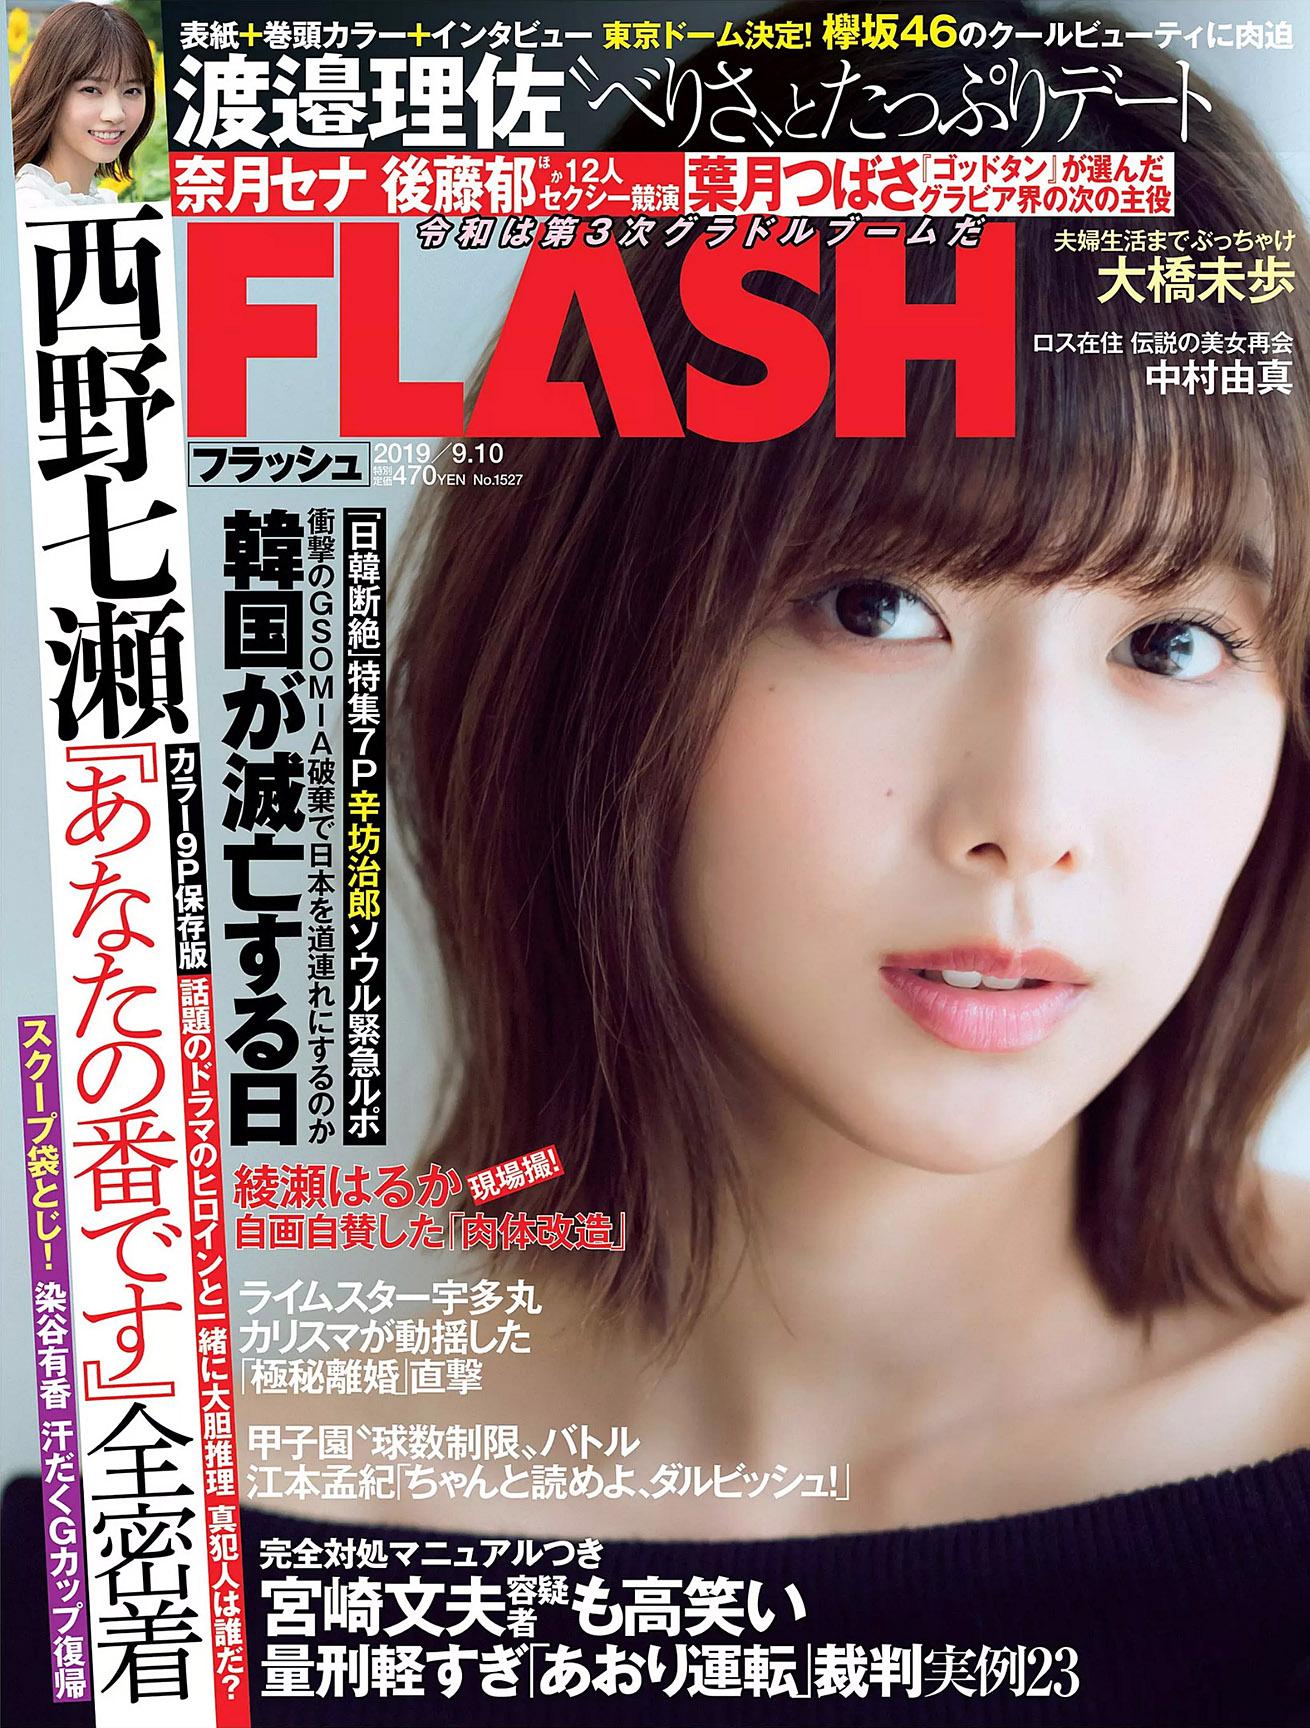 Risa Watanabe Flash 190910 01.jpg